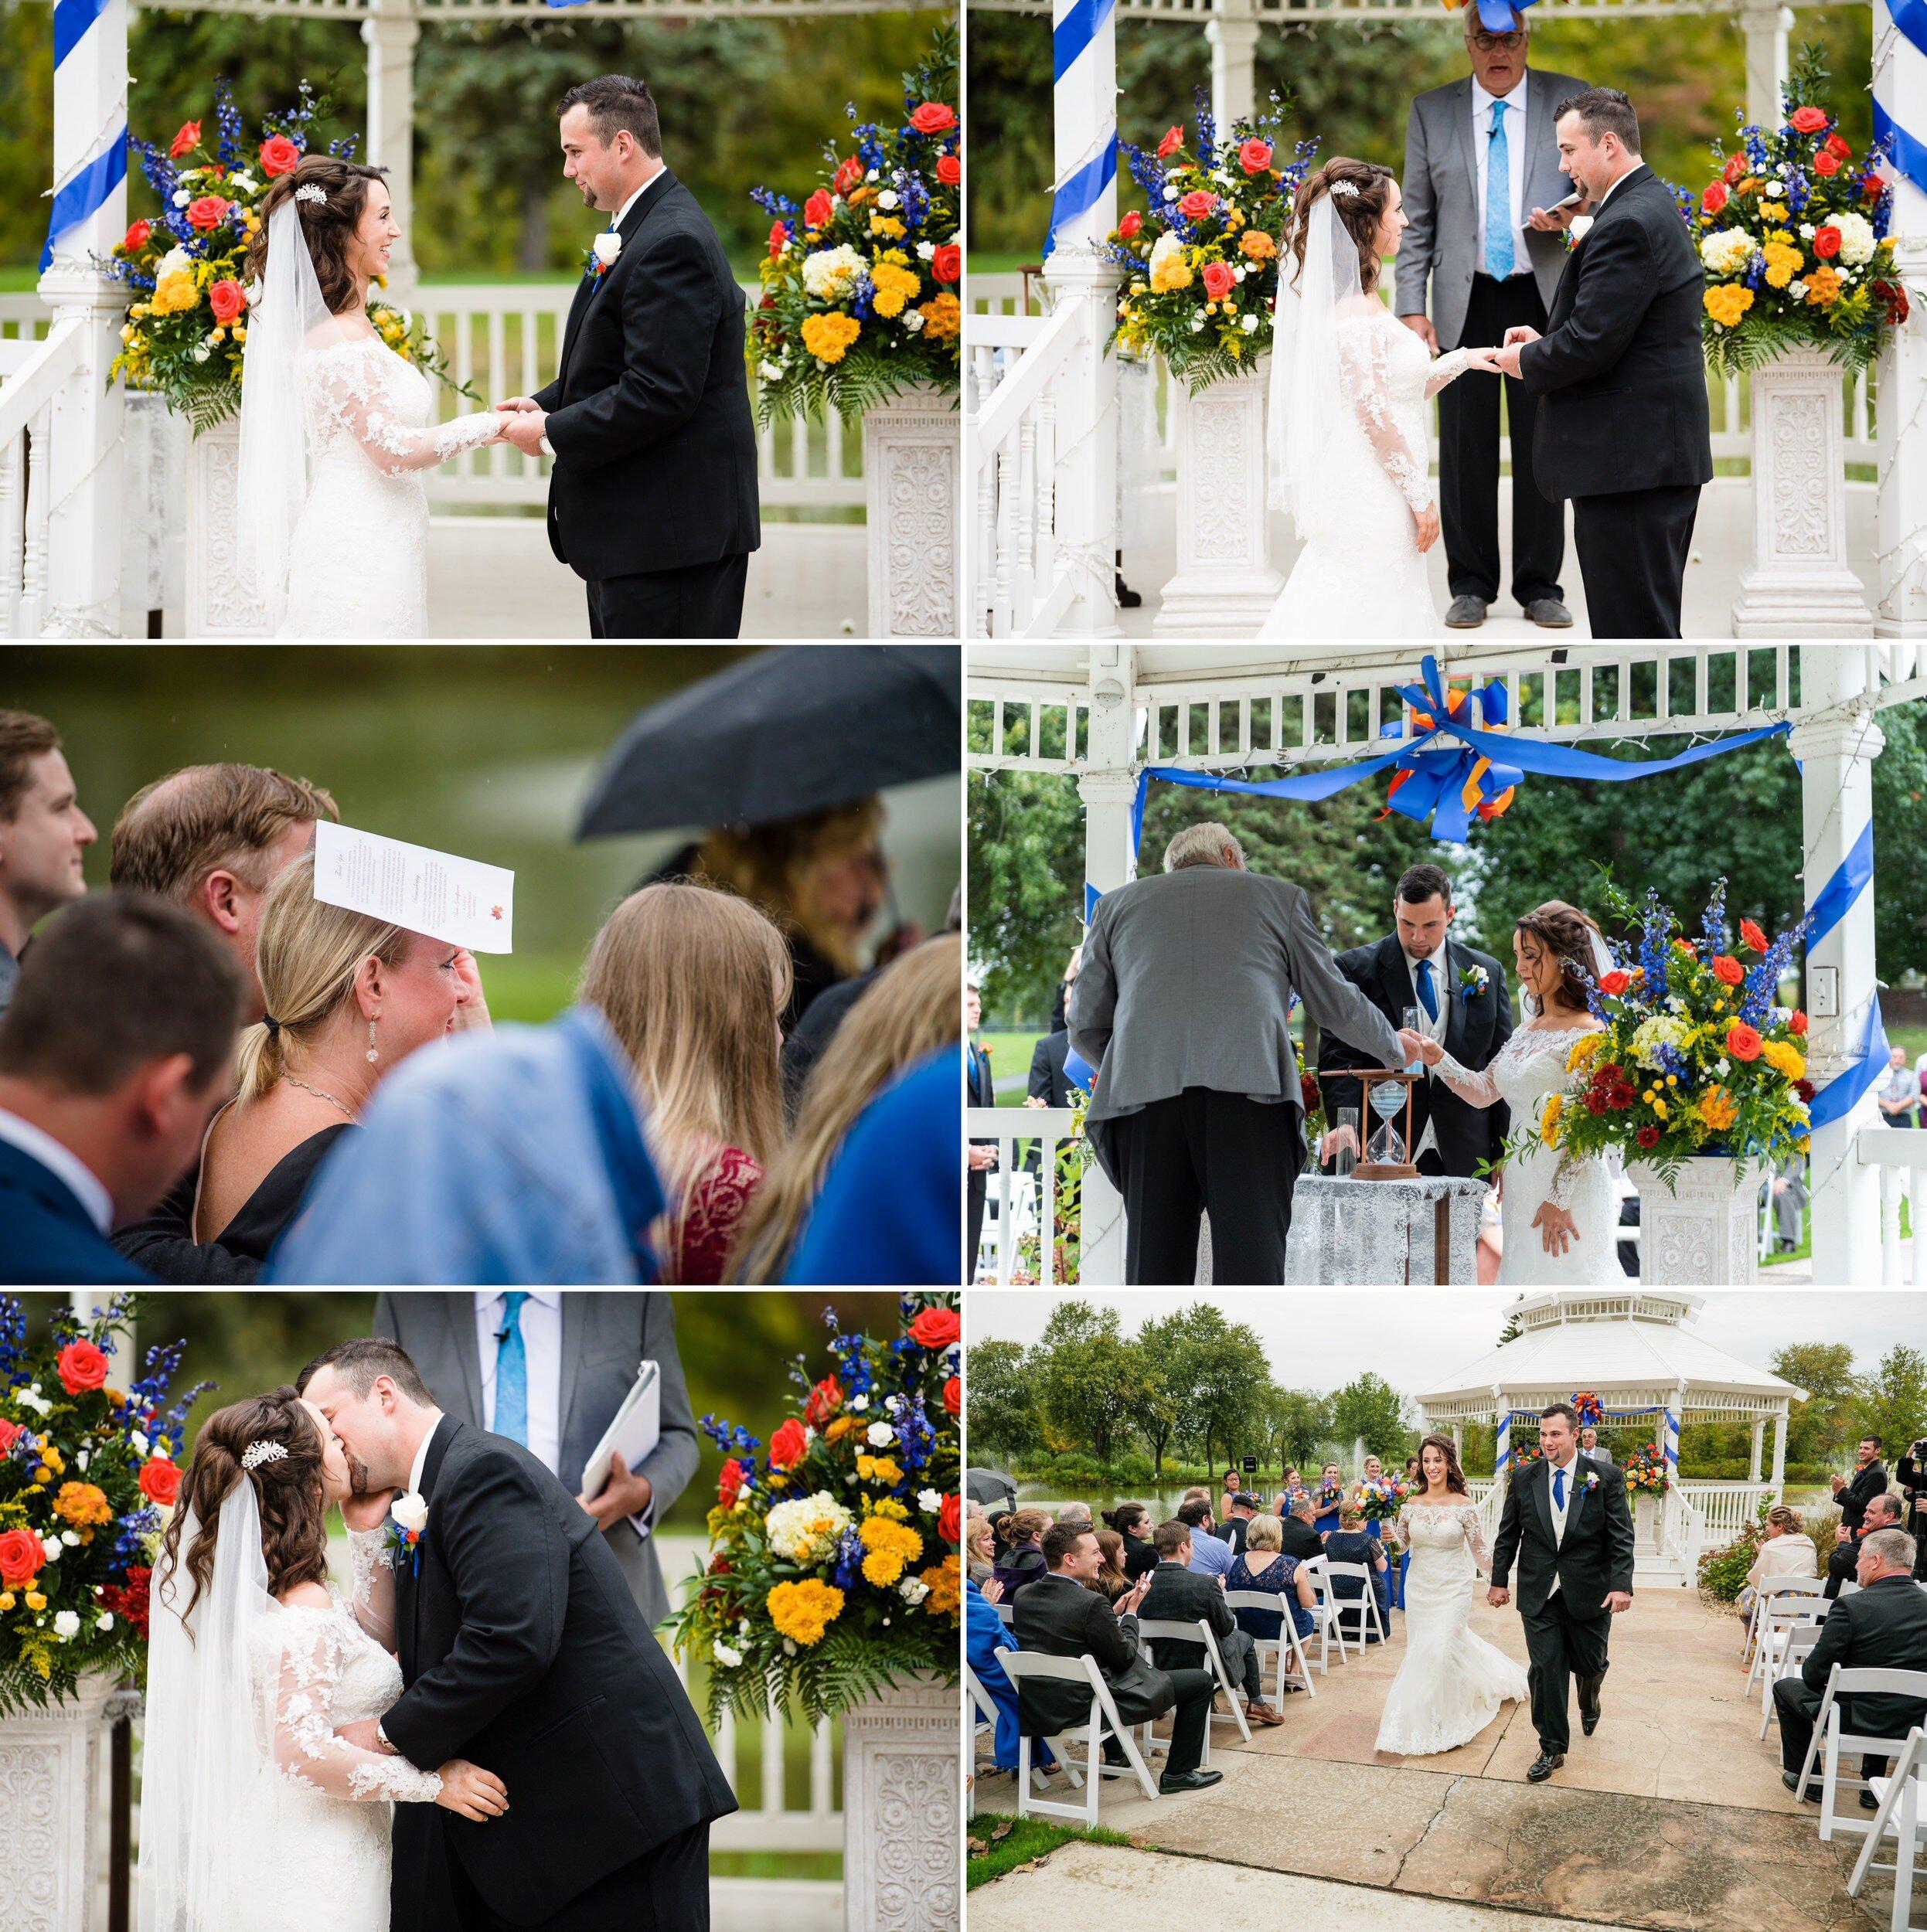 Autumn wedding at the gazebo of Wicker Park Social Center.